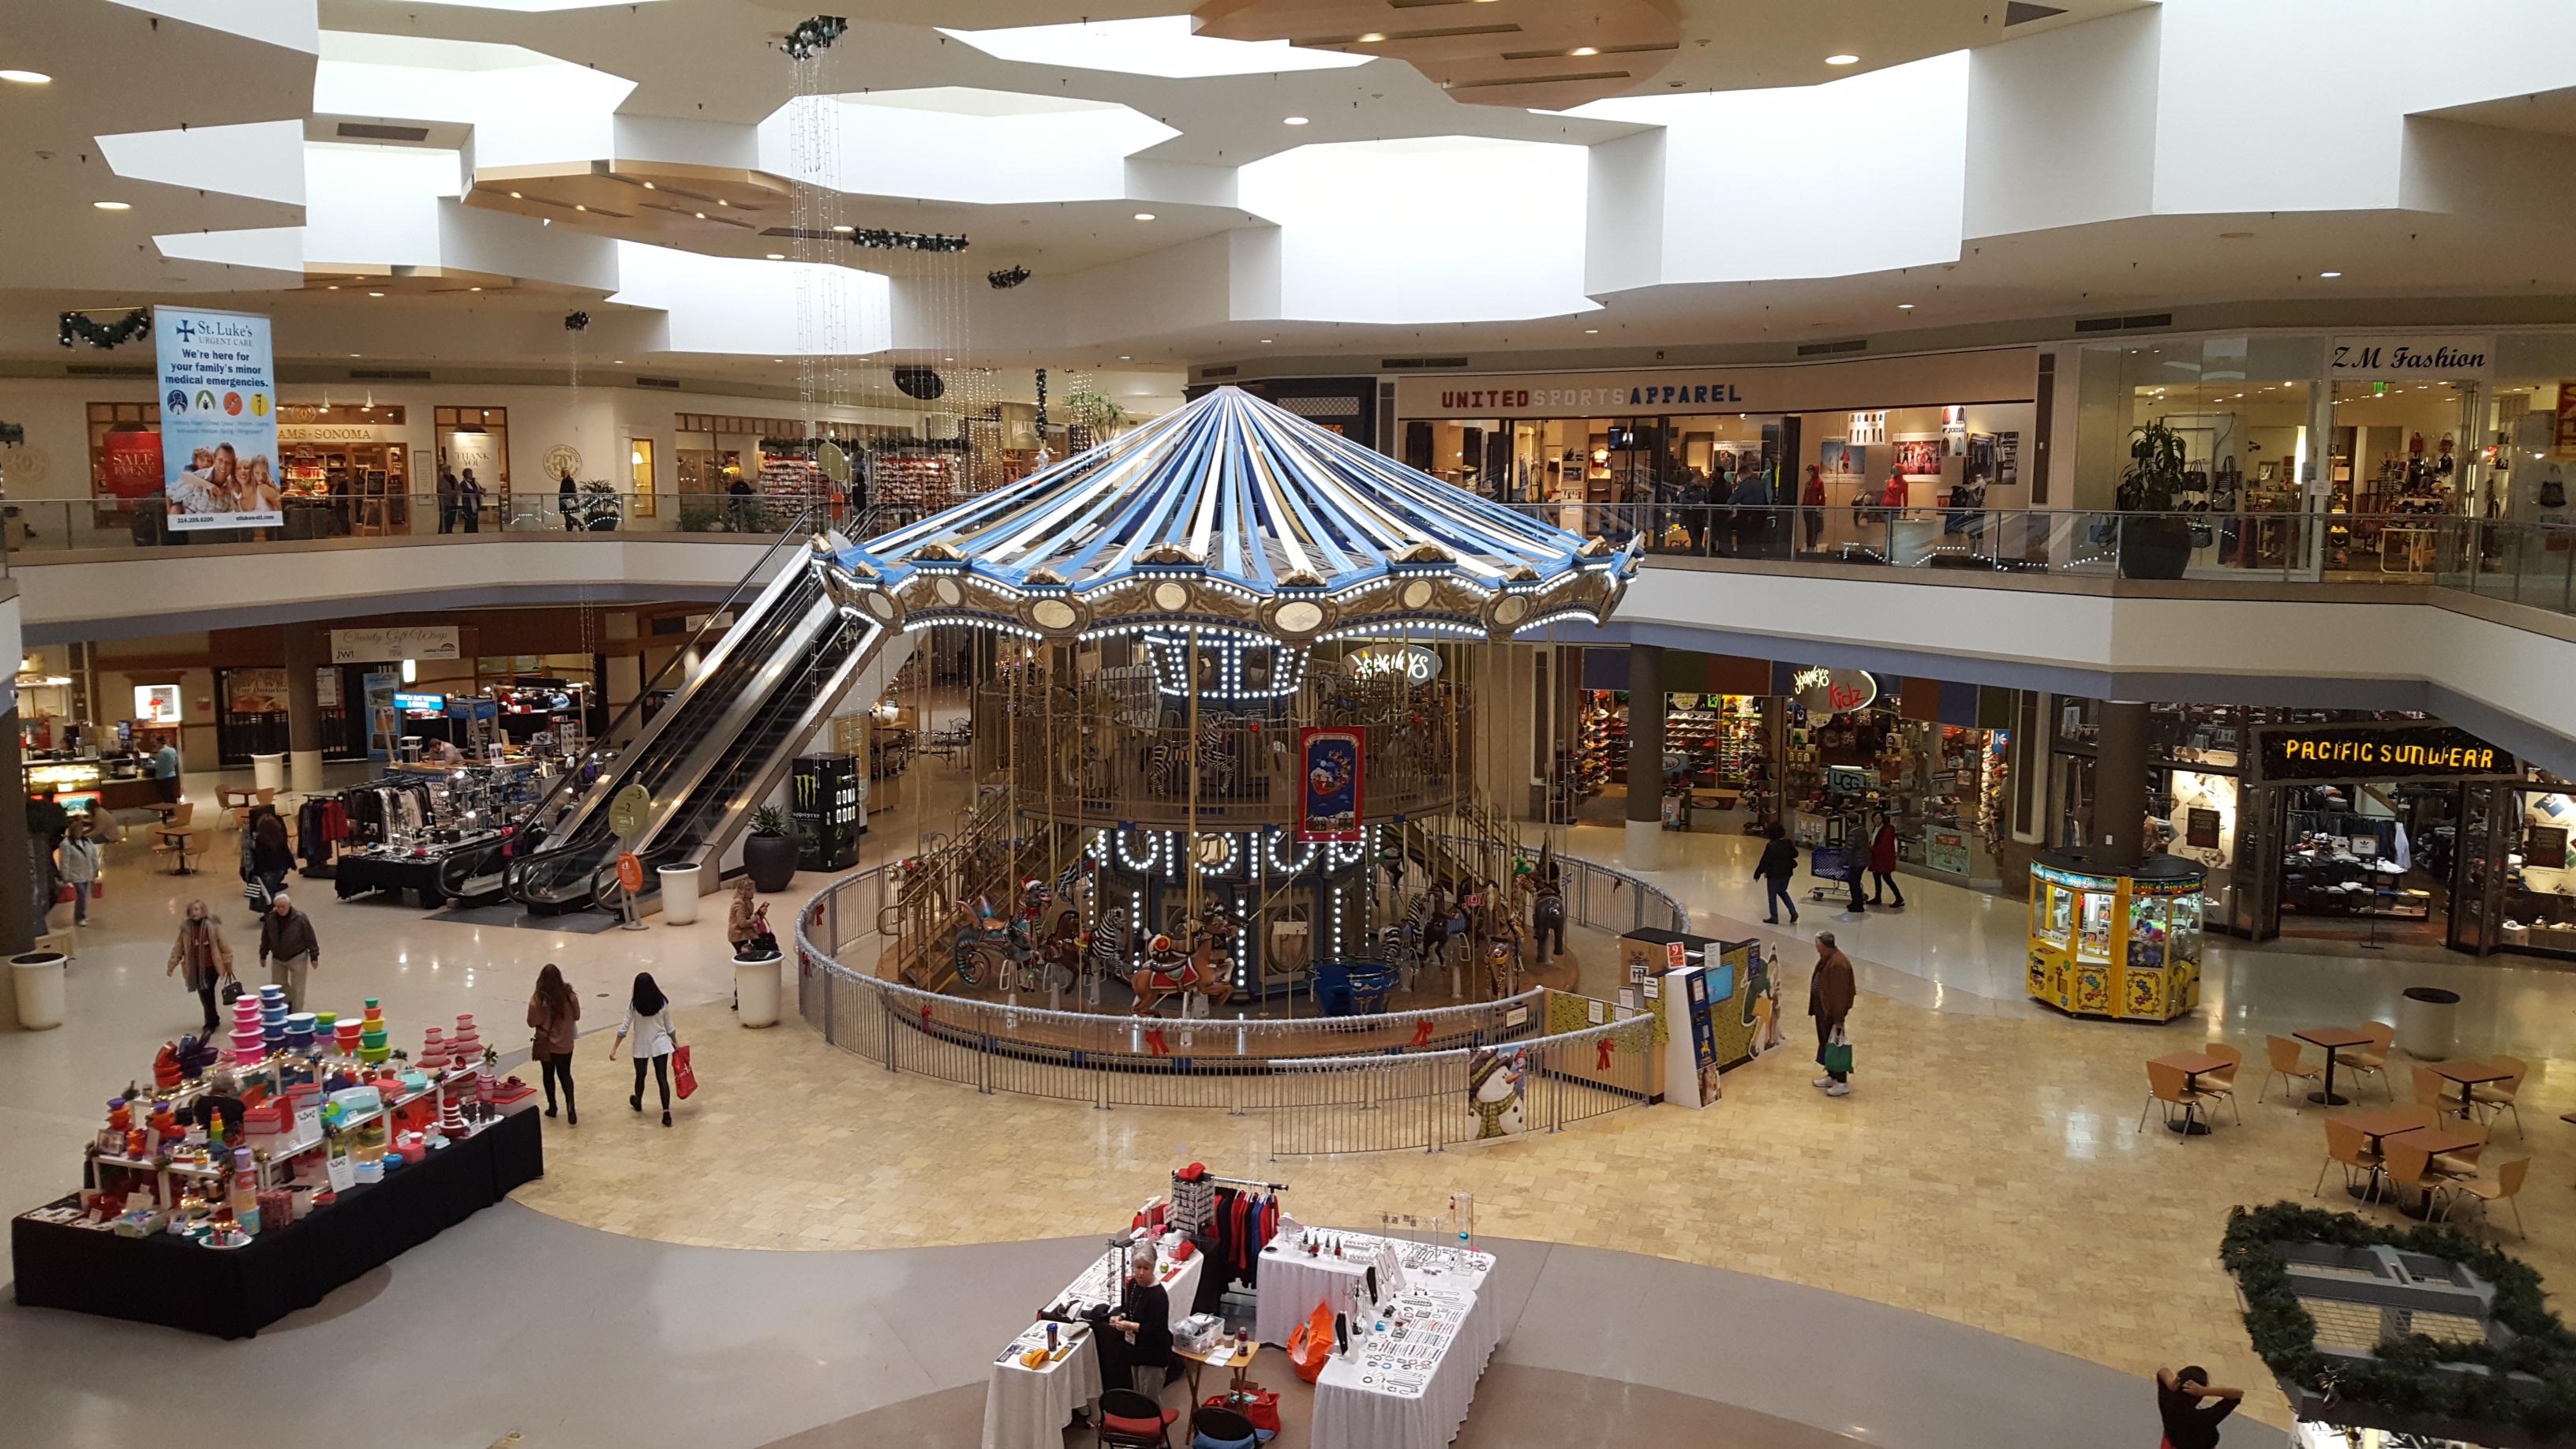 Chesterfield Mall - Wikipedia